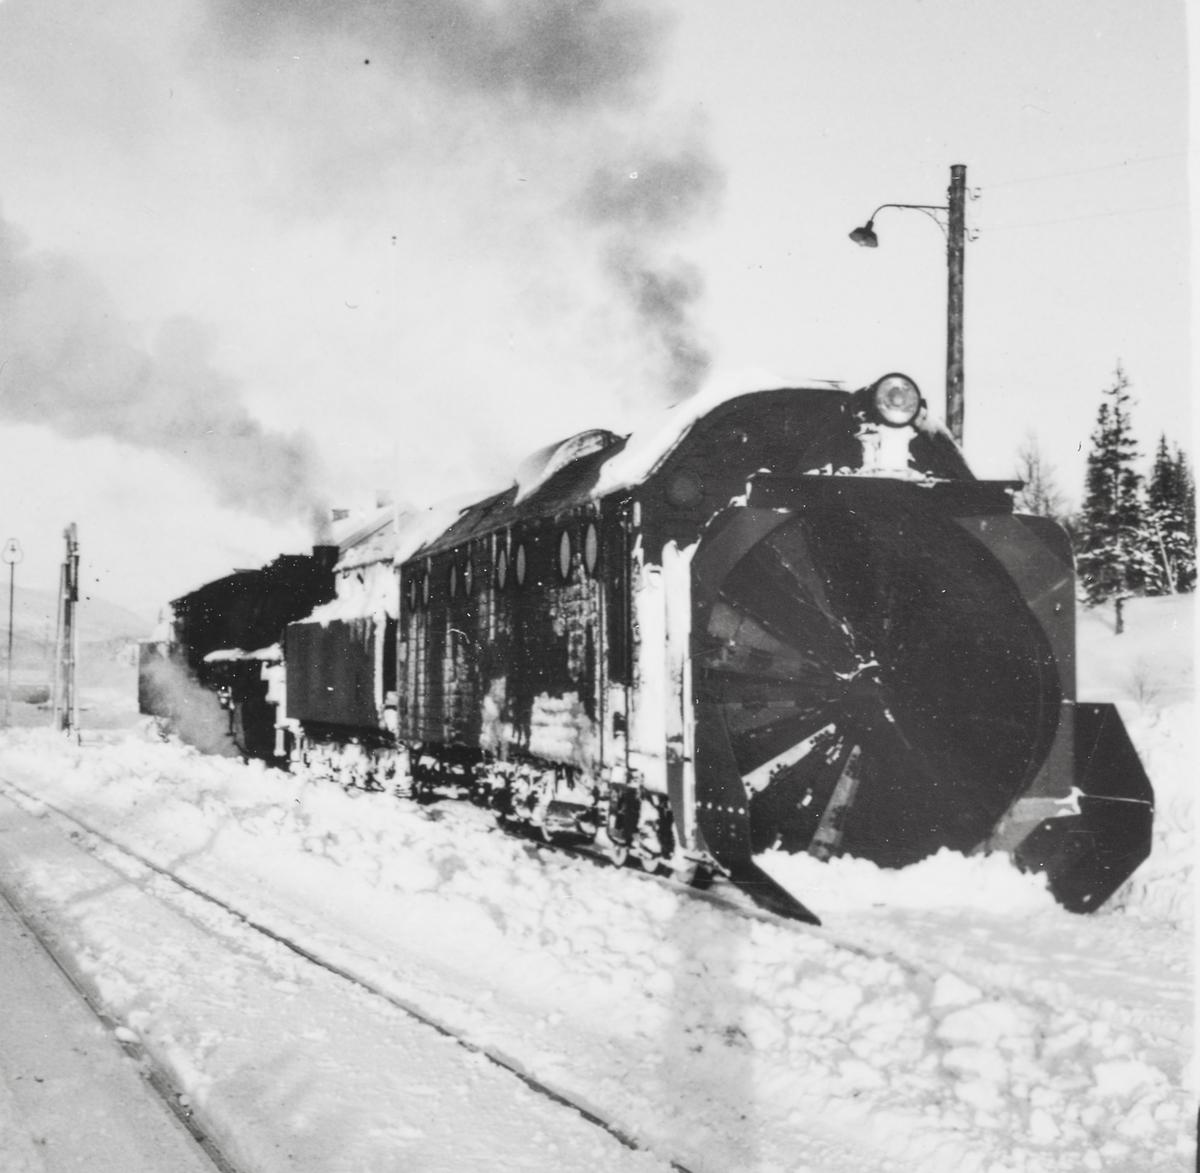 Snøryddingstog på Nordlandsbanen. Nærmest roterende snøplog type III, bak damplokomotiv type 33c nr. 396.